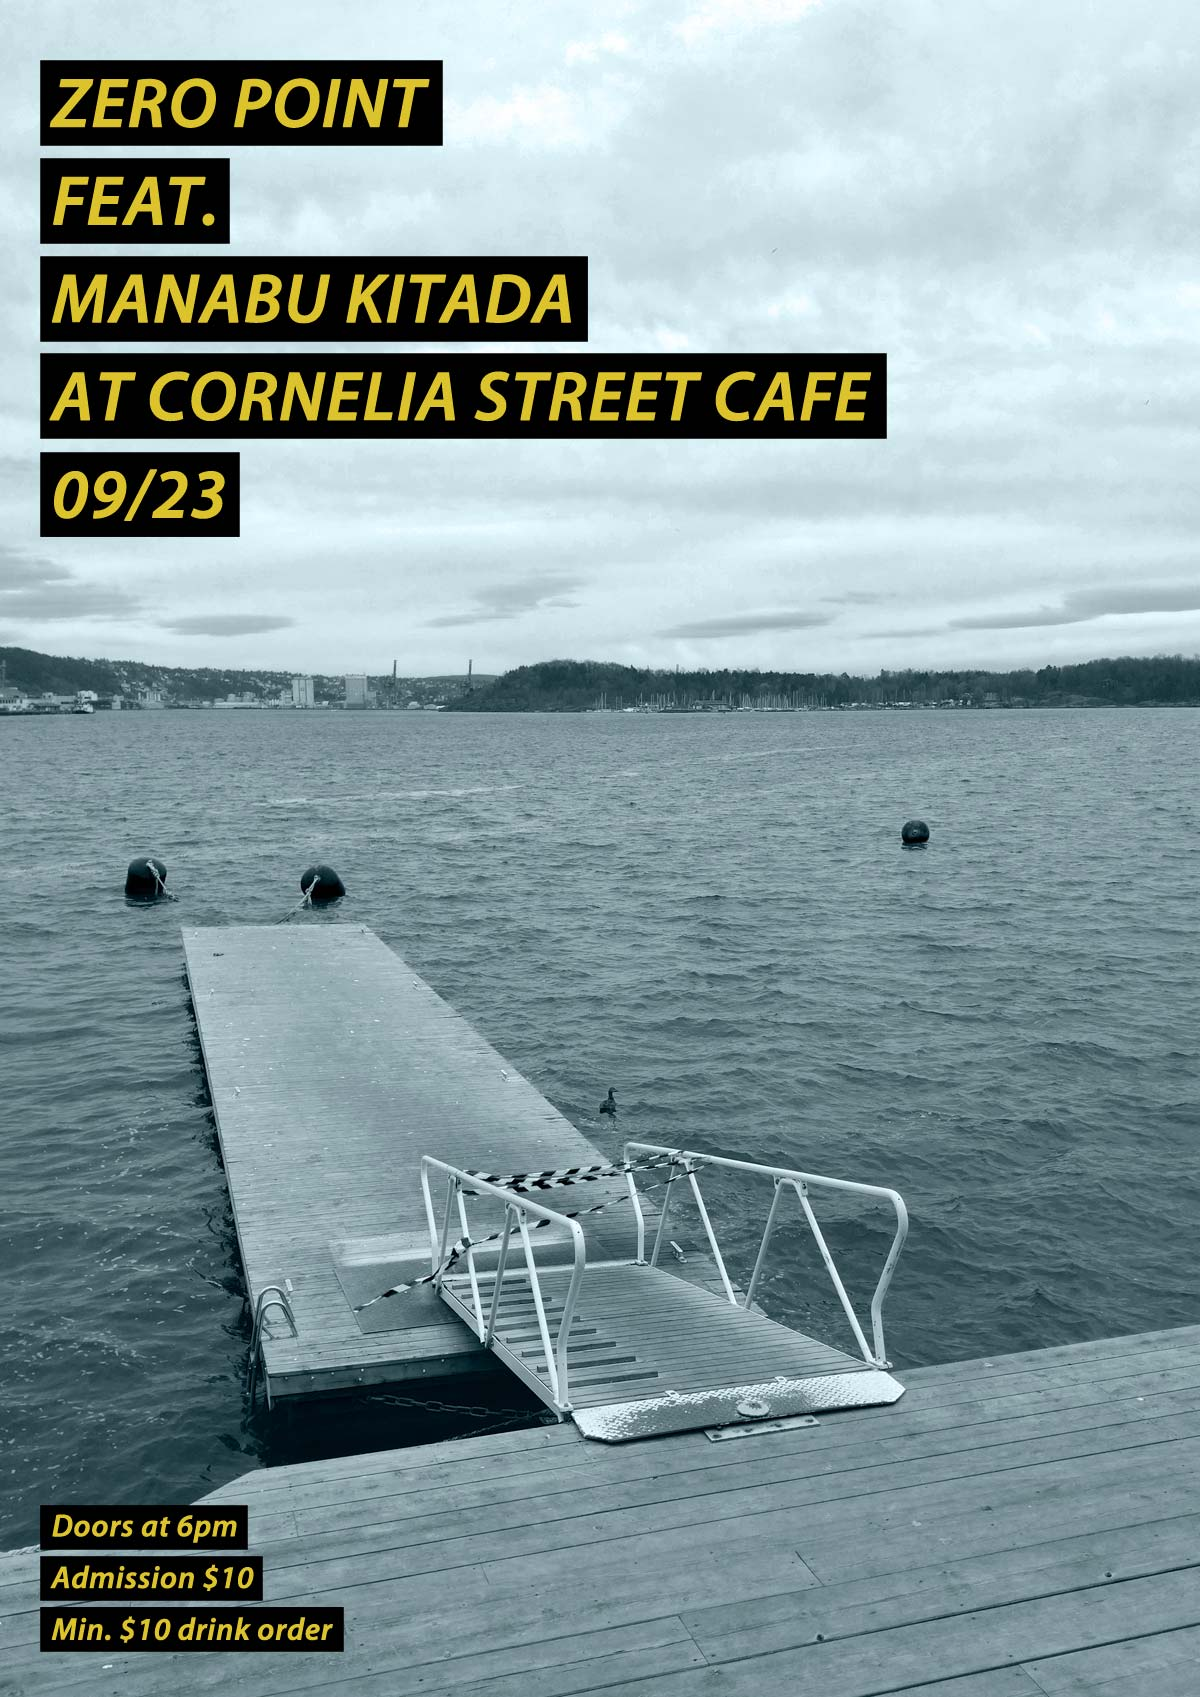 Zero Point feat. Manabu Kitada Flyer